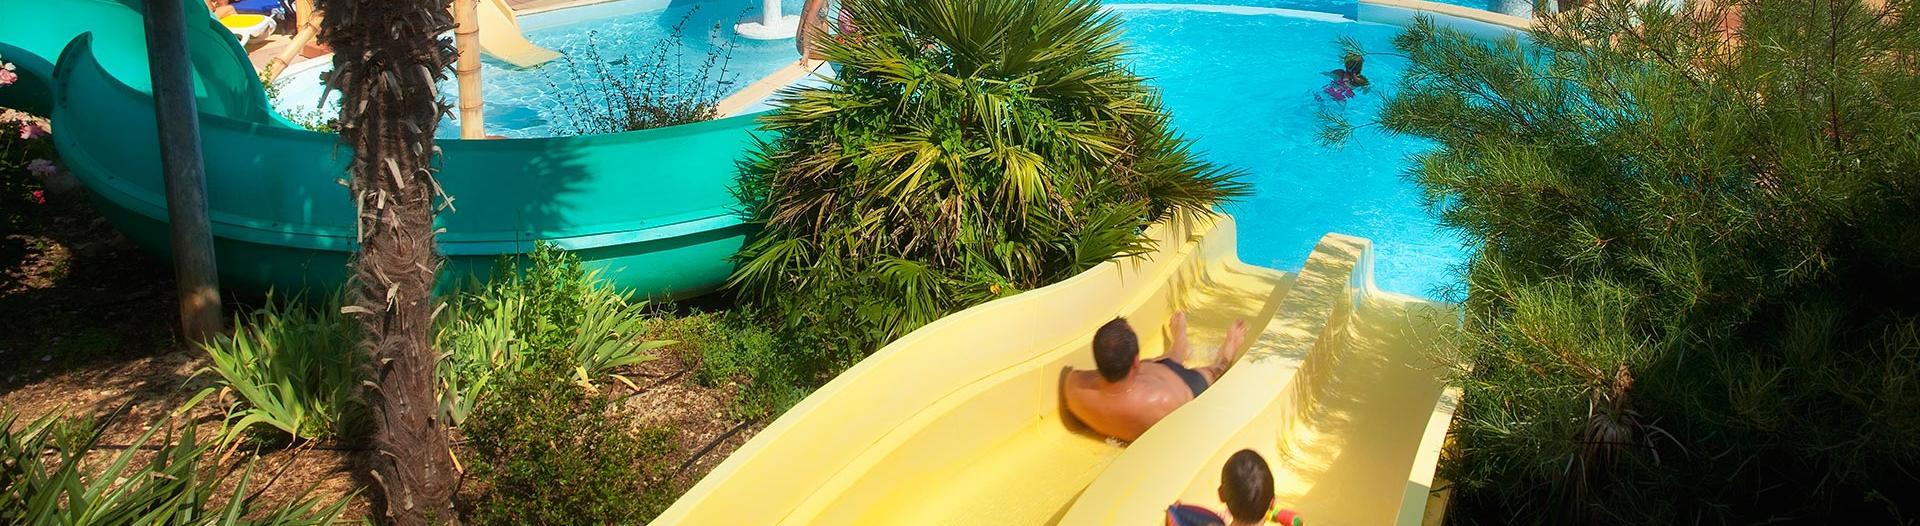 slider-camping-bois-soleil-toboggan-aquatique